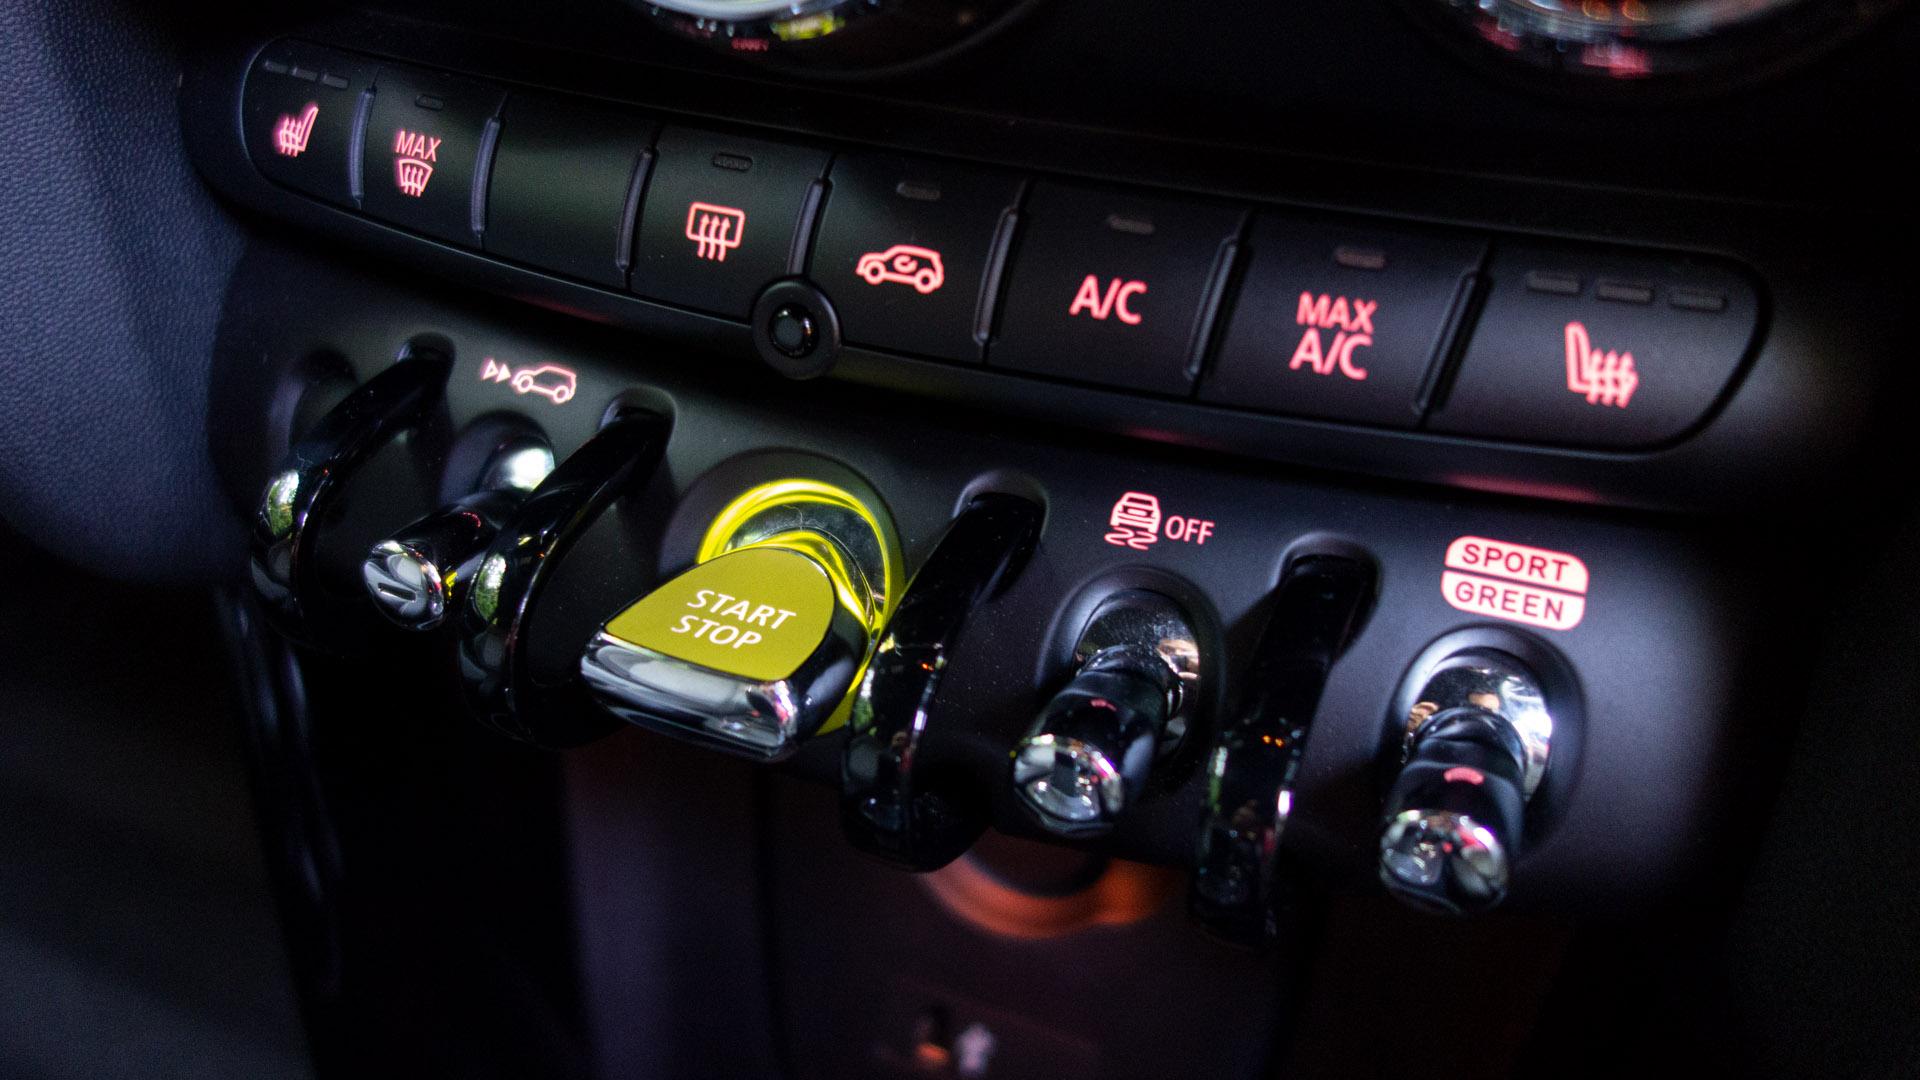 Mini Electric controls